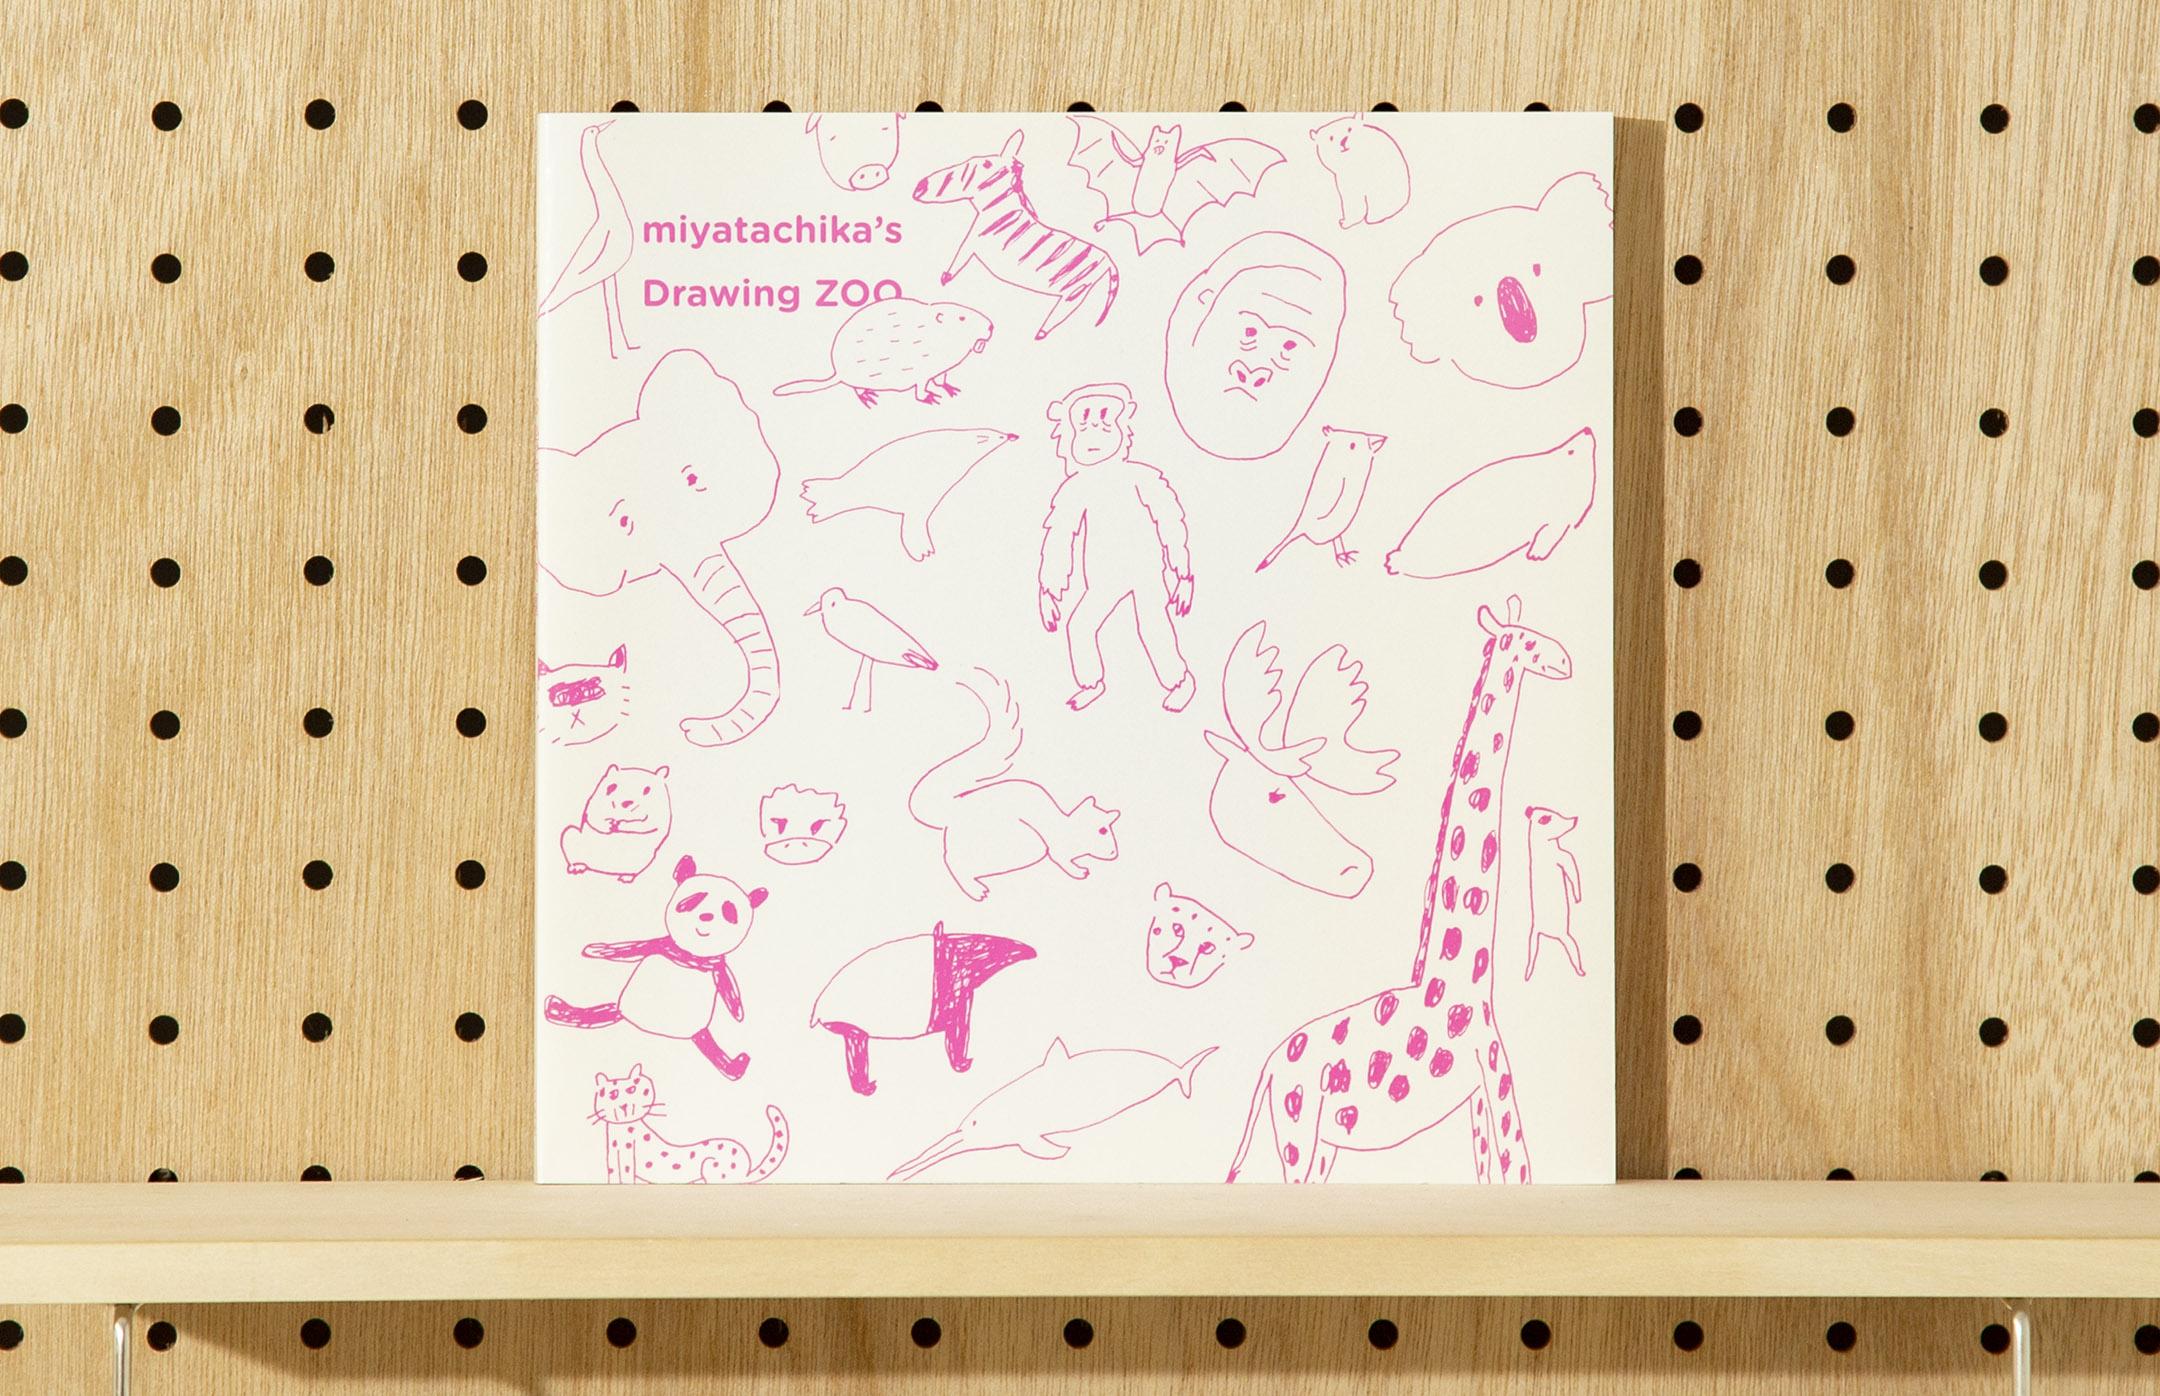 soda design ミヤタチカの お絵描き動物園 ゆるく楽しい描き方レッスン